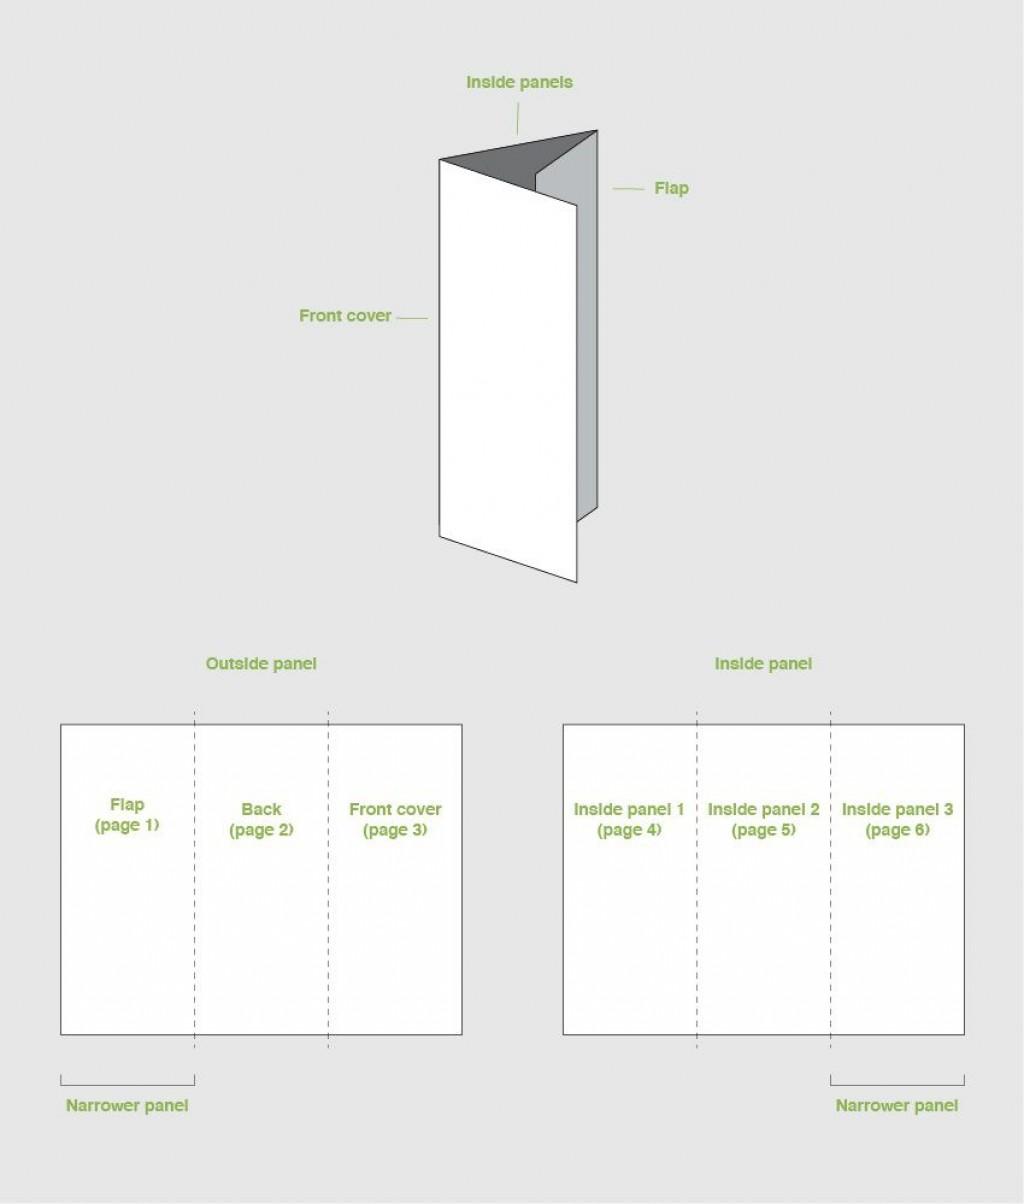 000 Marvelou Tri Fold Pamphlet Template Photo  Brochure Free Google Doc Word 2007Large